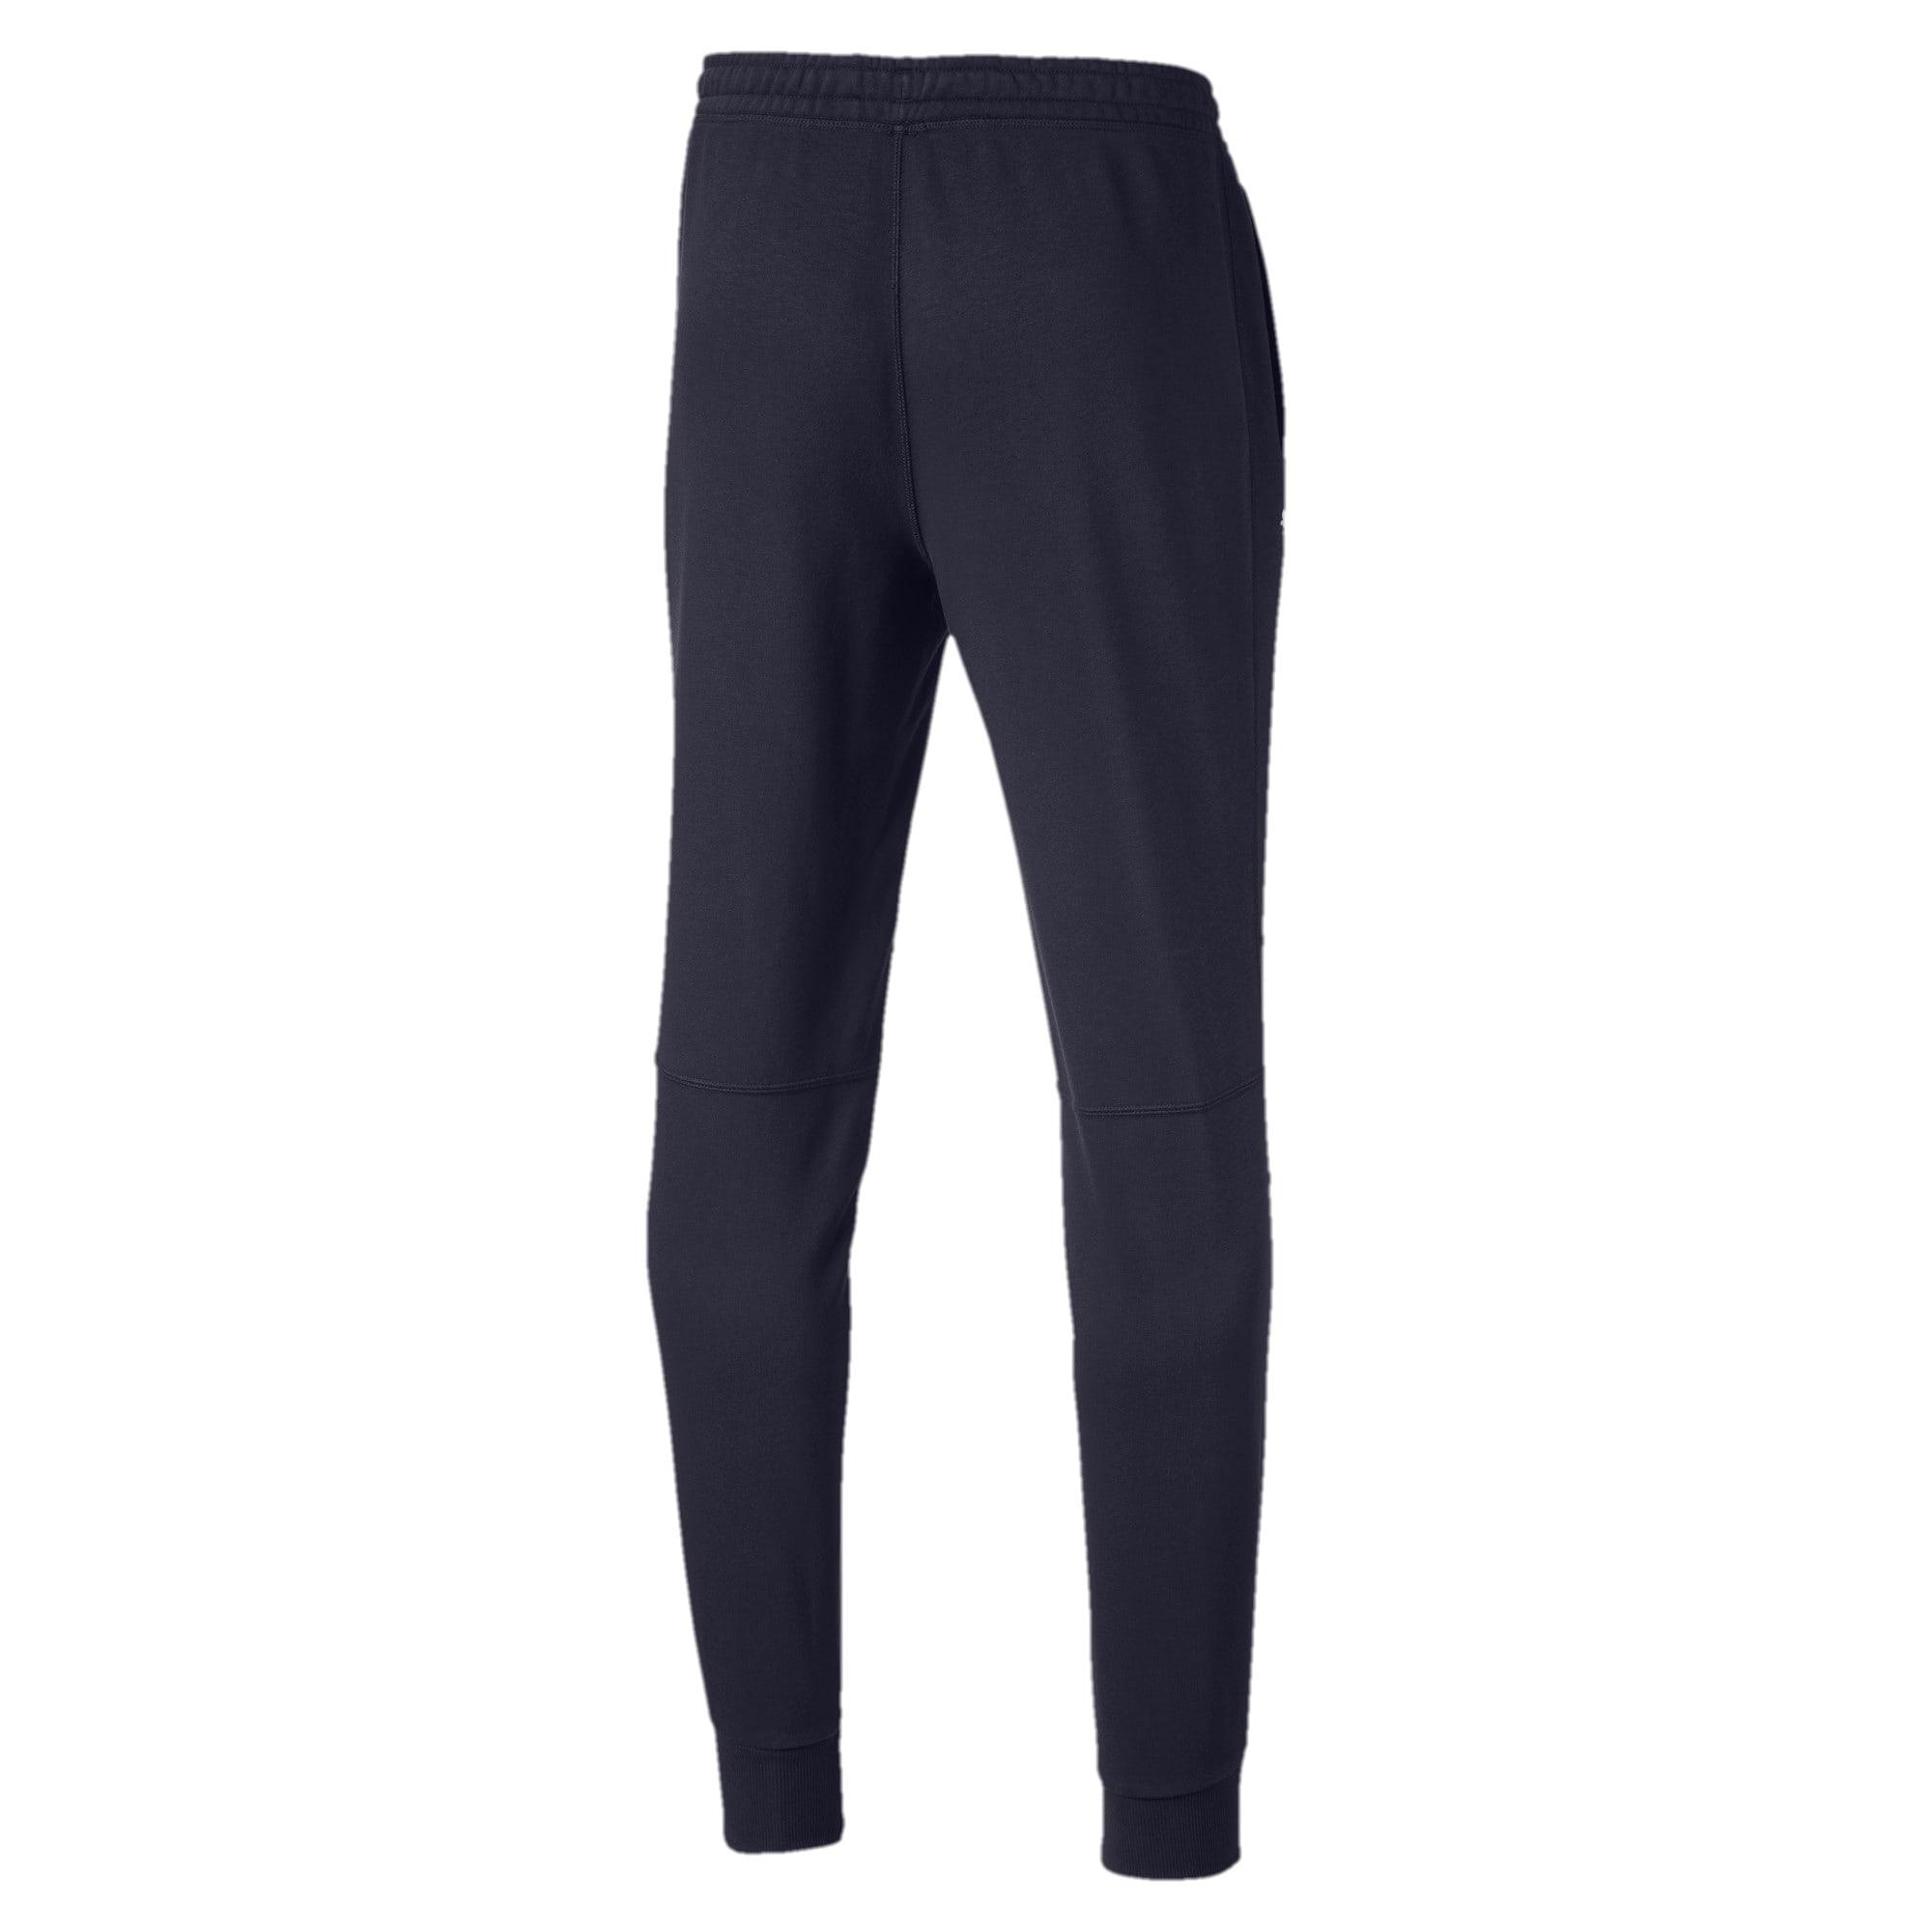 Thumbnail 5 of Red Bull Racing Knitted Men's Sweat Pants, NIGHT SKY, medium